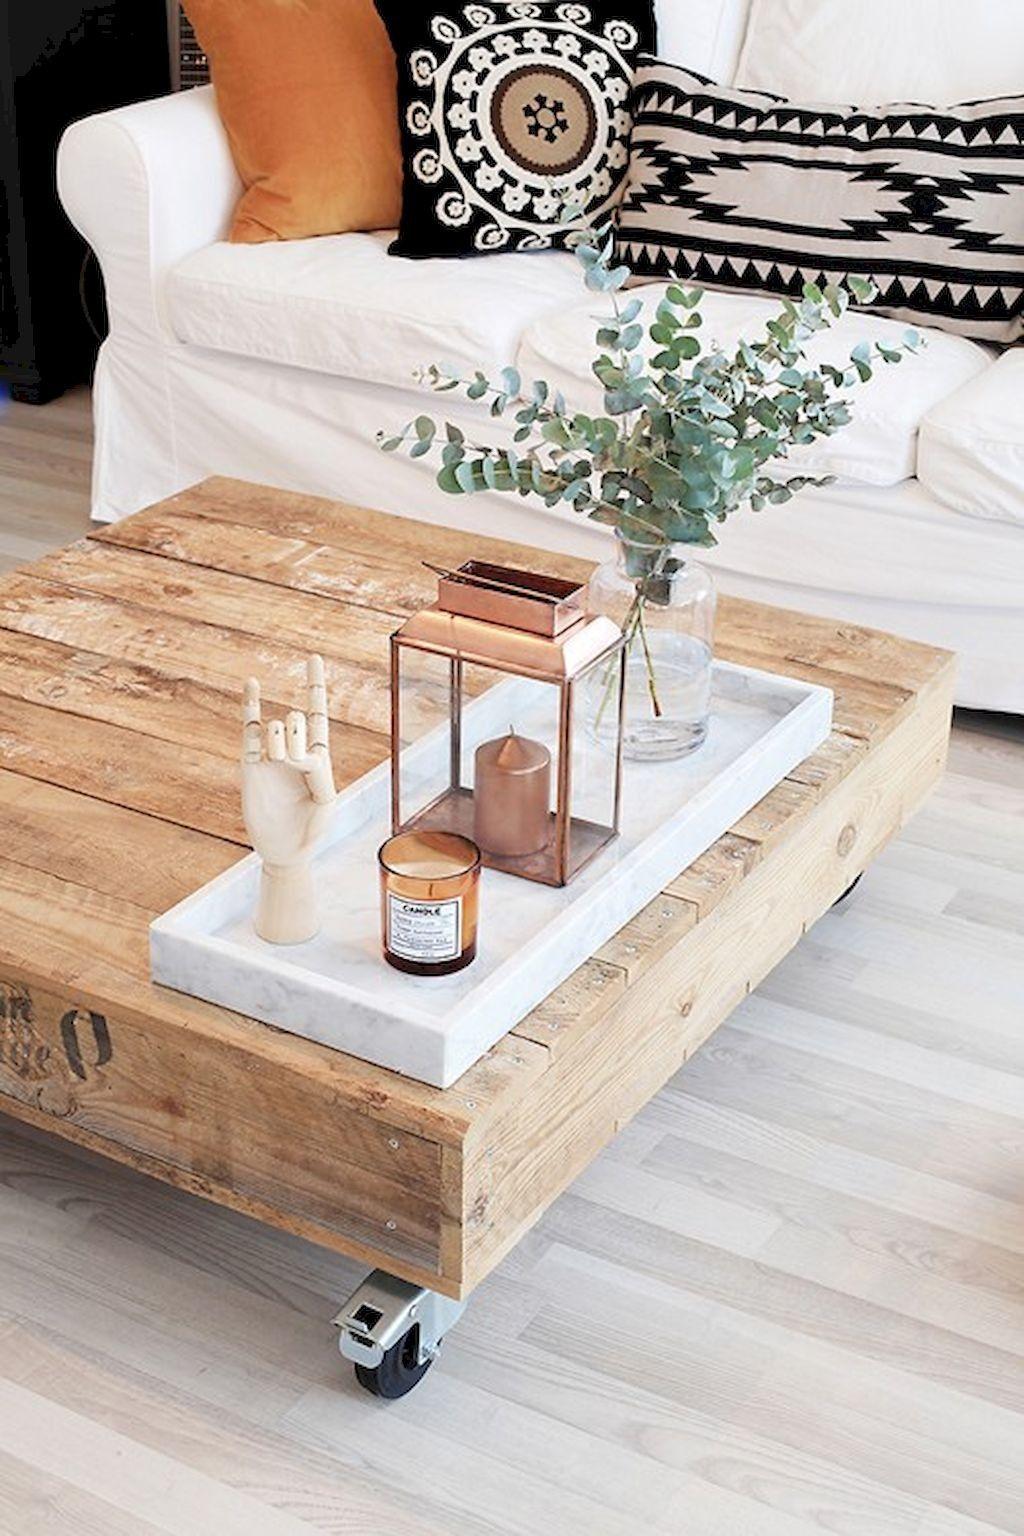 89 amazing farmhouse coffee table ideas decor home decor boho chic living room on boho chic kitchen table decor id=17252